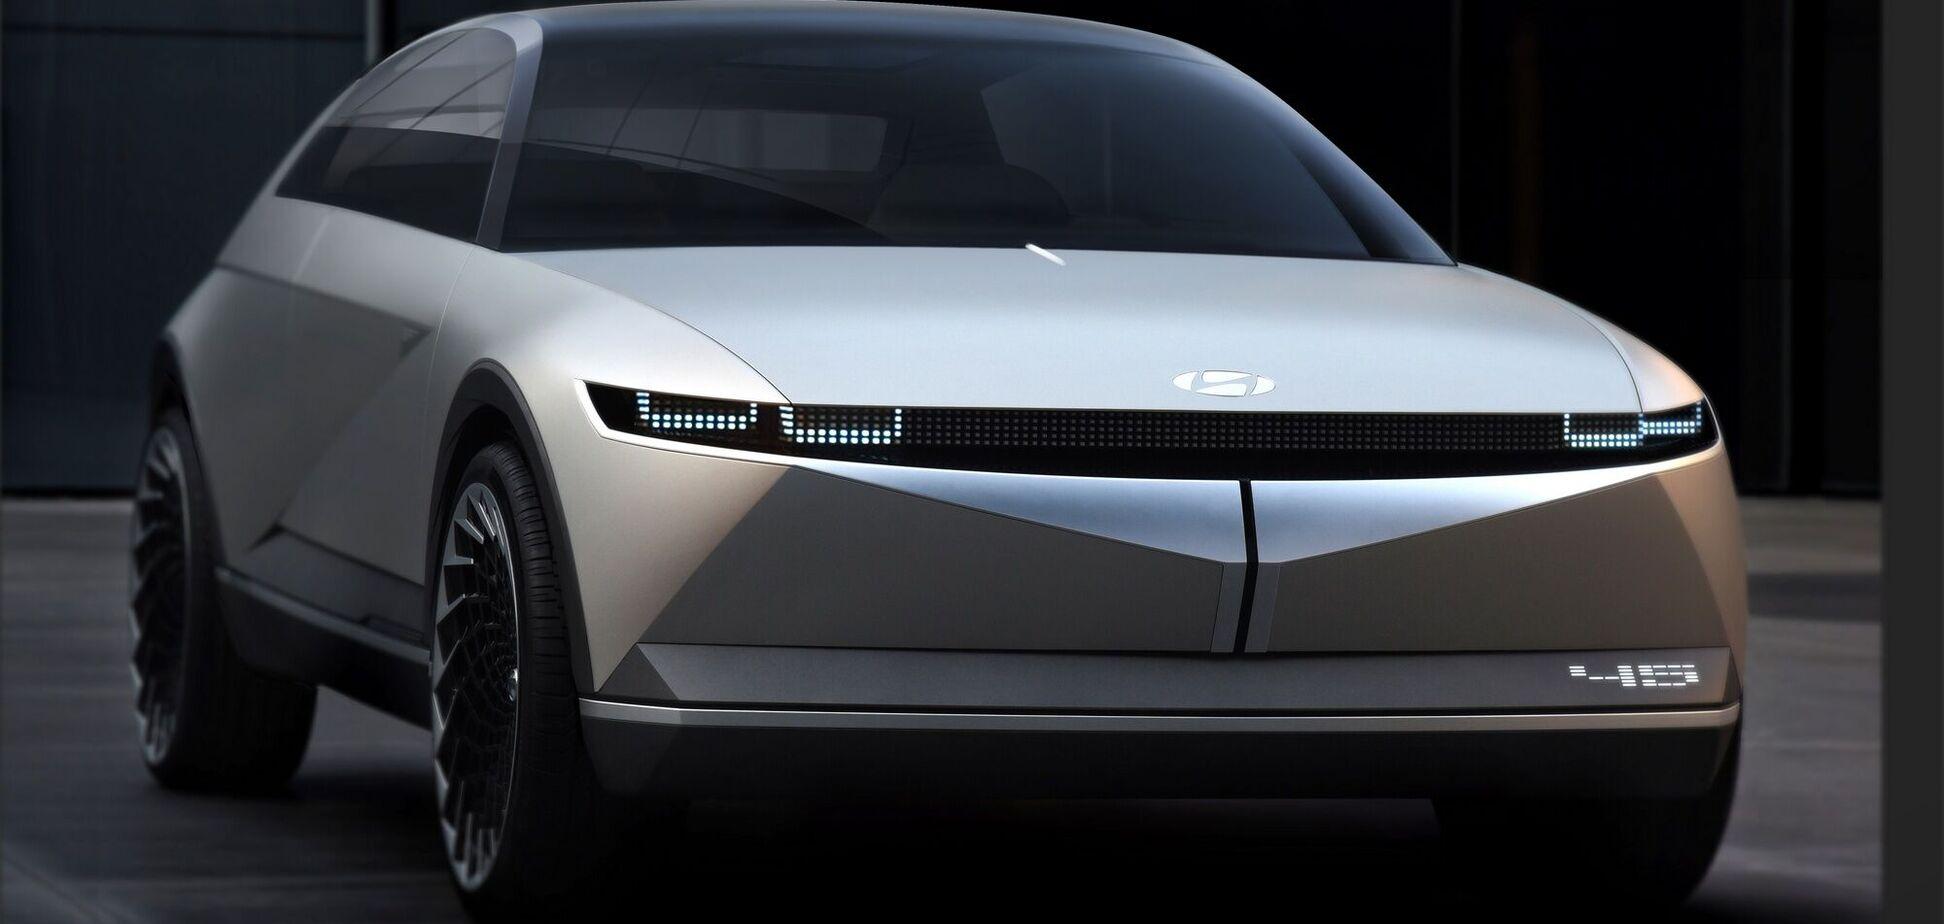 Розкрито характеристики електрокара Hyundai, який кине виклик Volkswagen